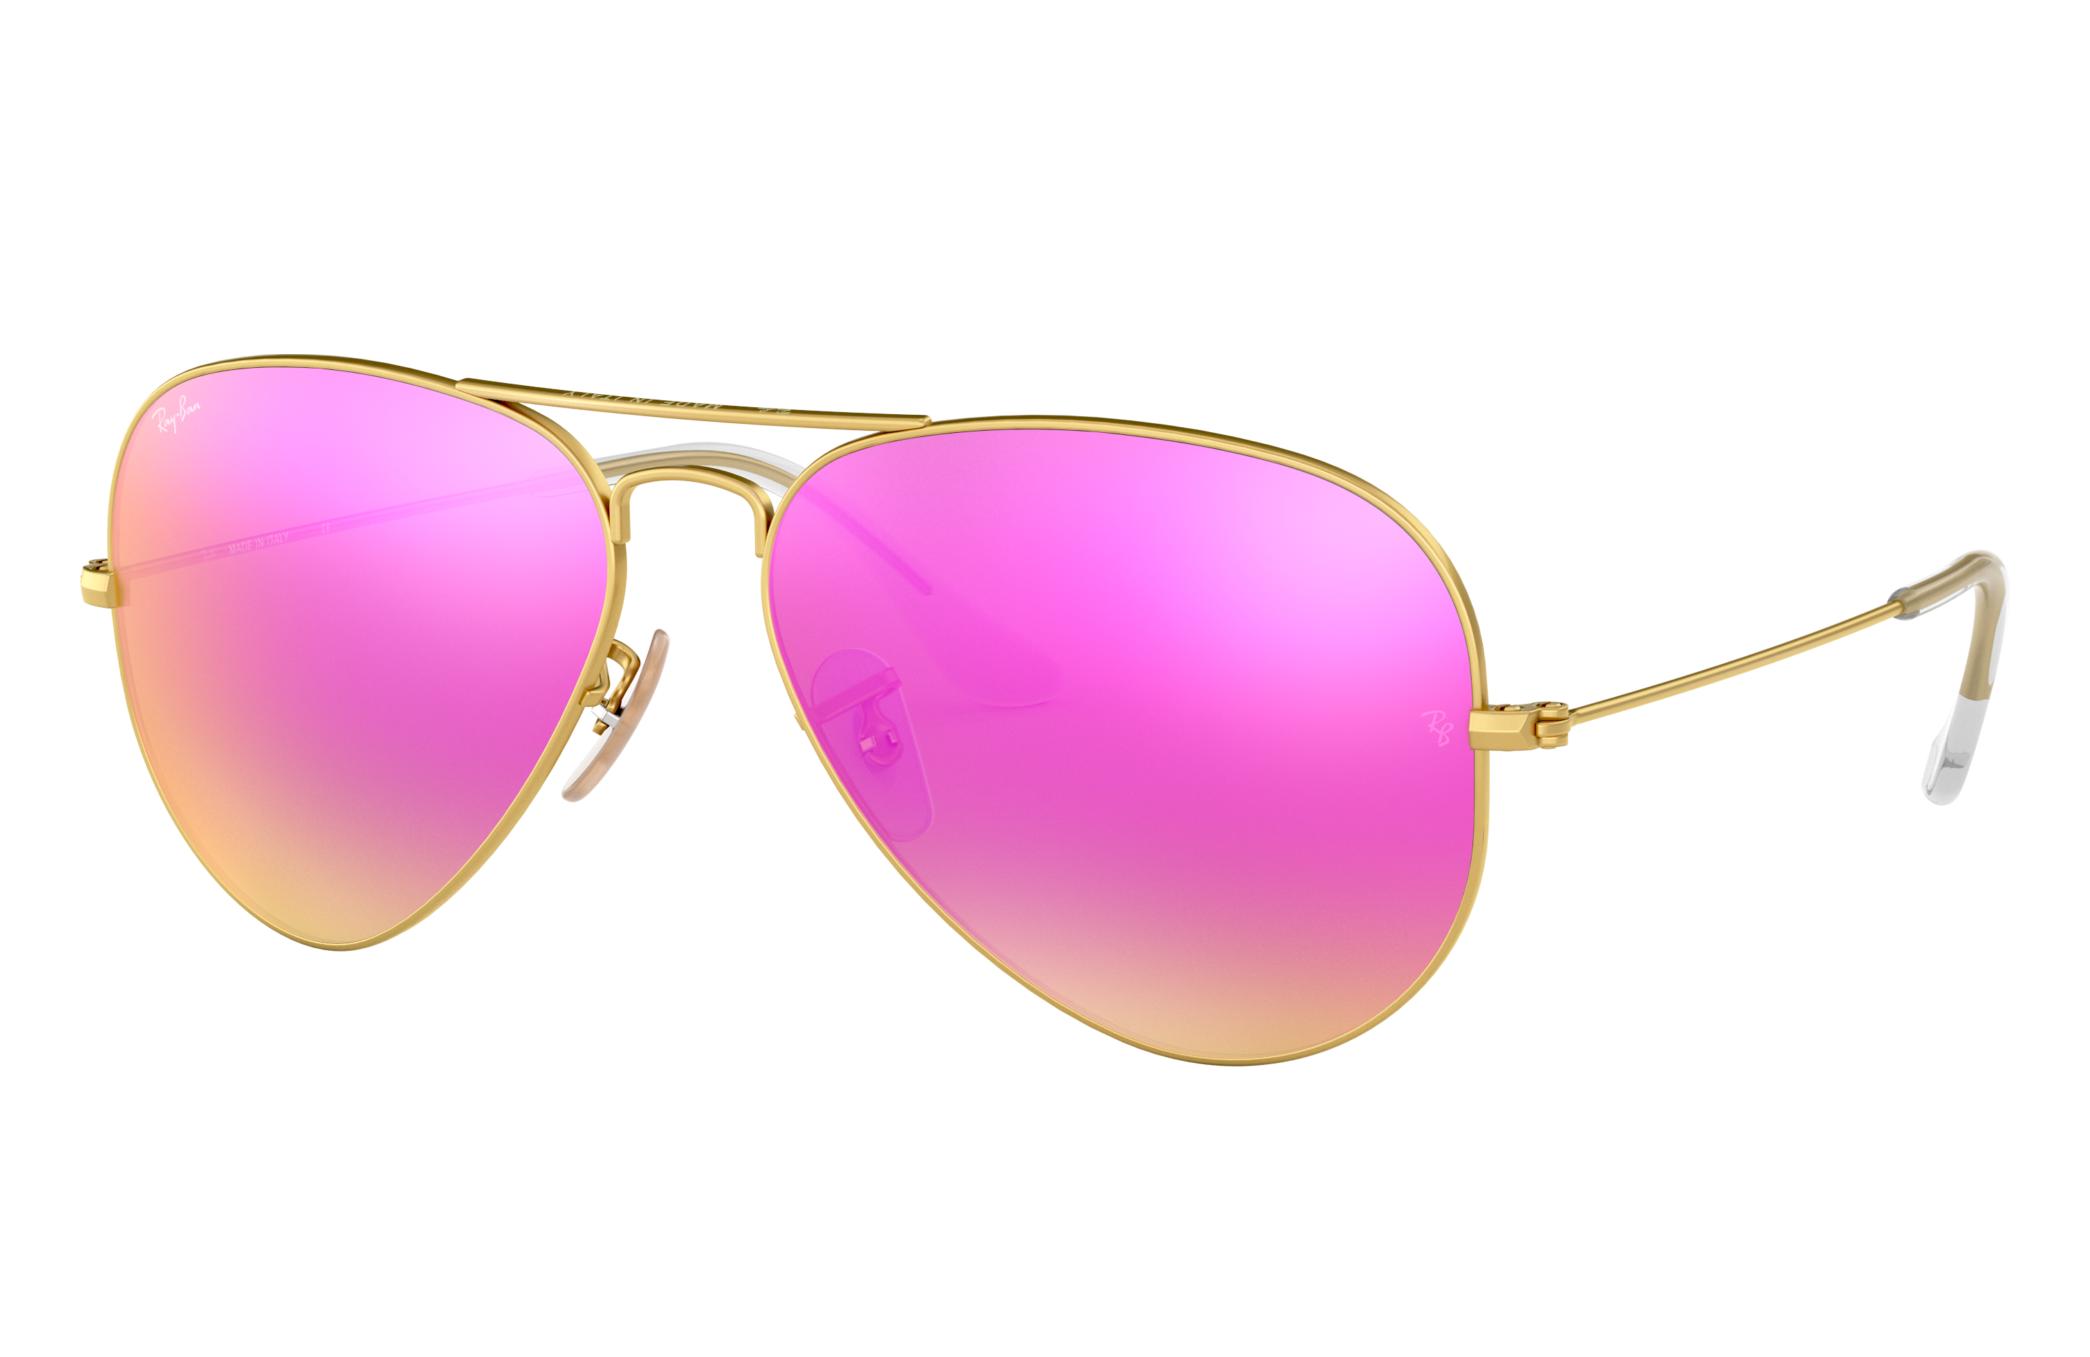 Ray-Ban Aviator Flash Lenses Gold, Violet Lenses - RB3025